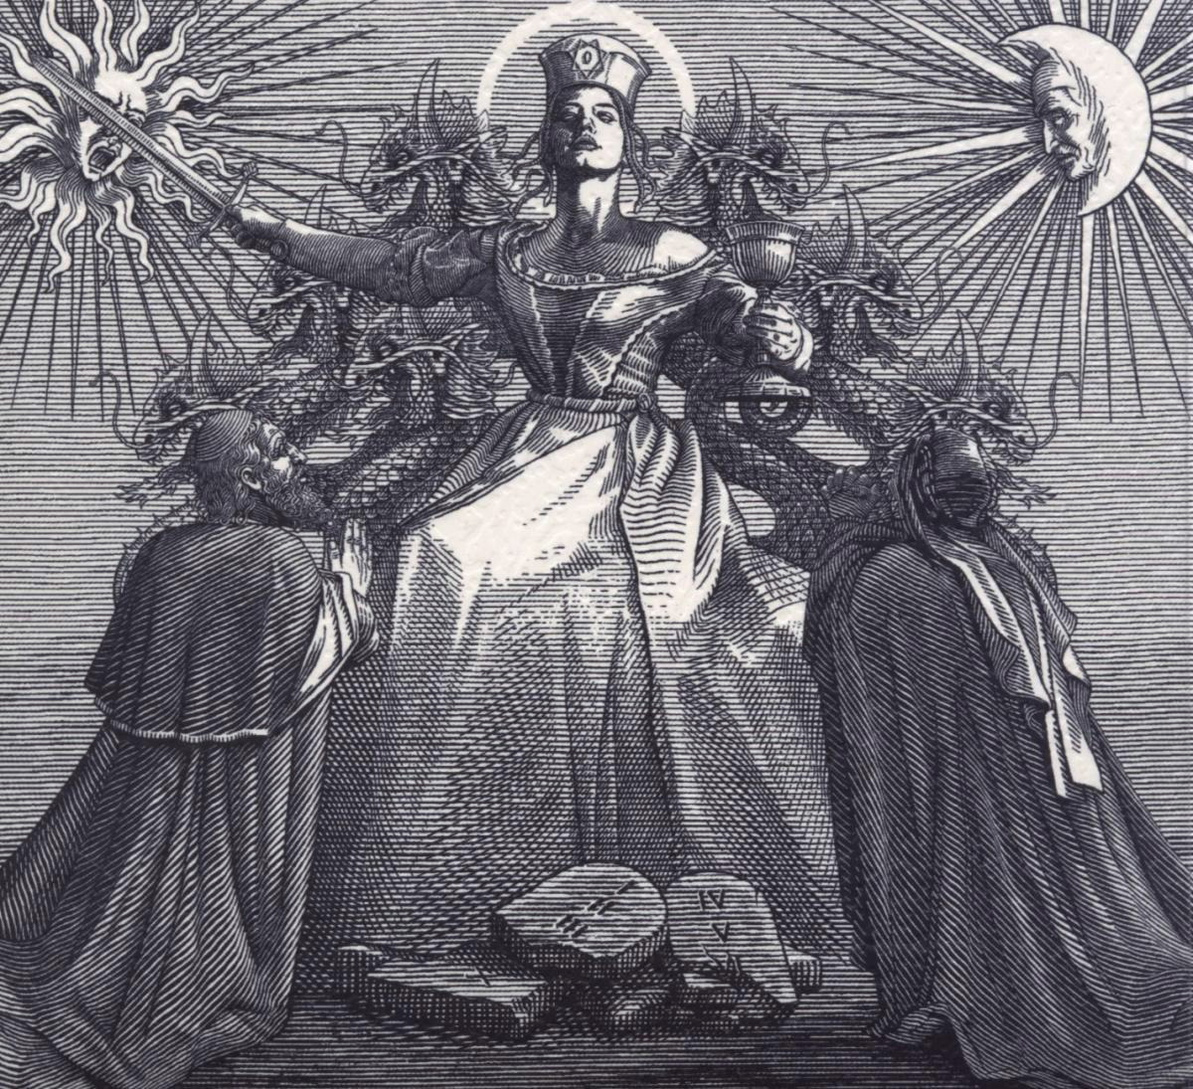 behemoth evangelion wallpaper wwwimgkidcom the image